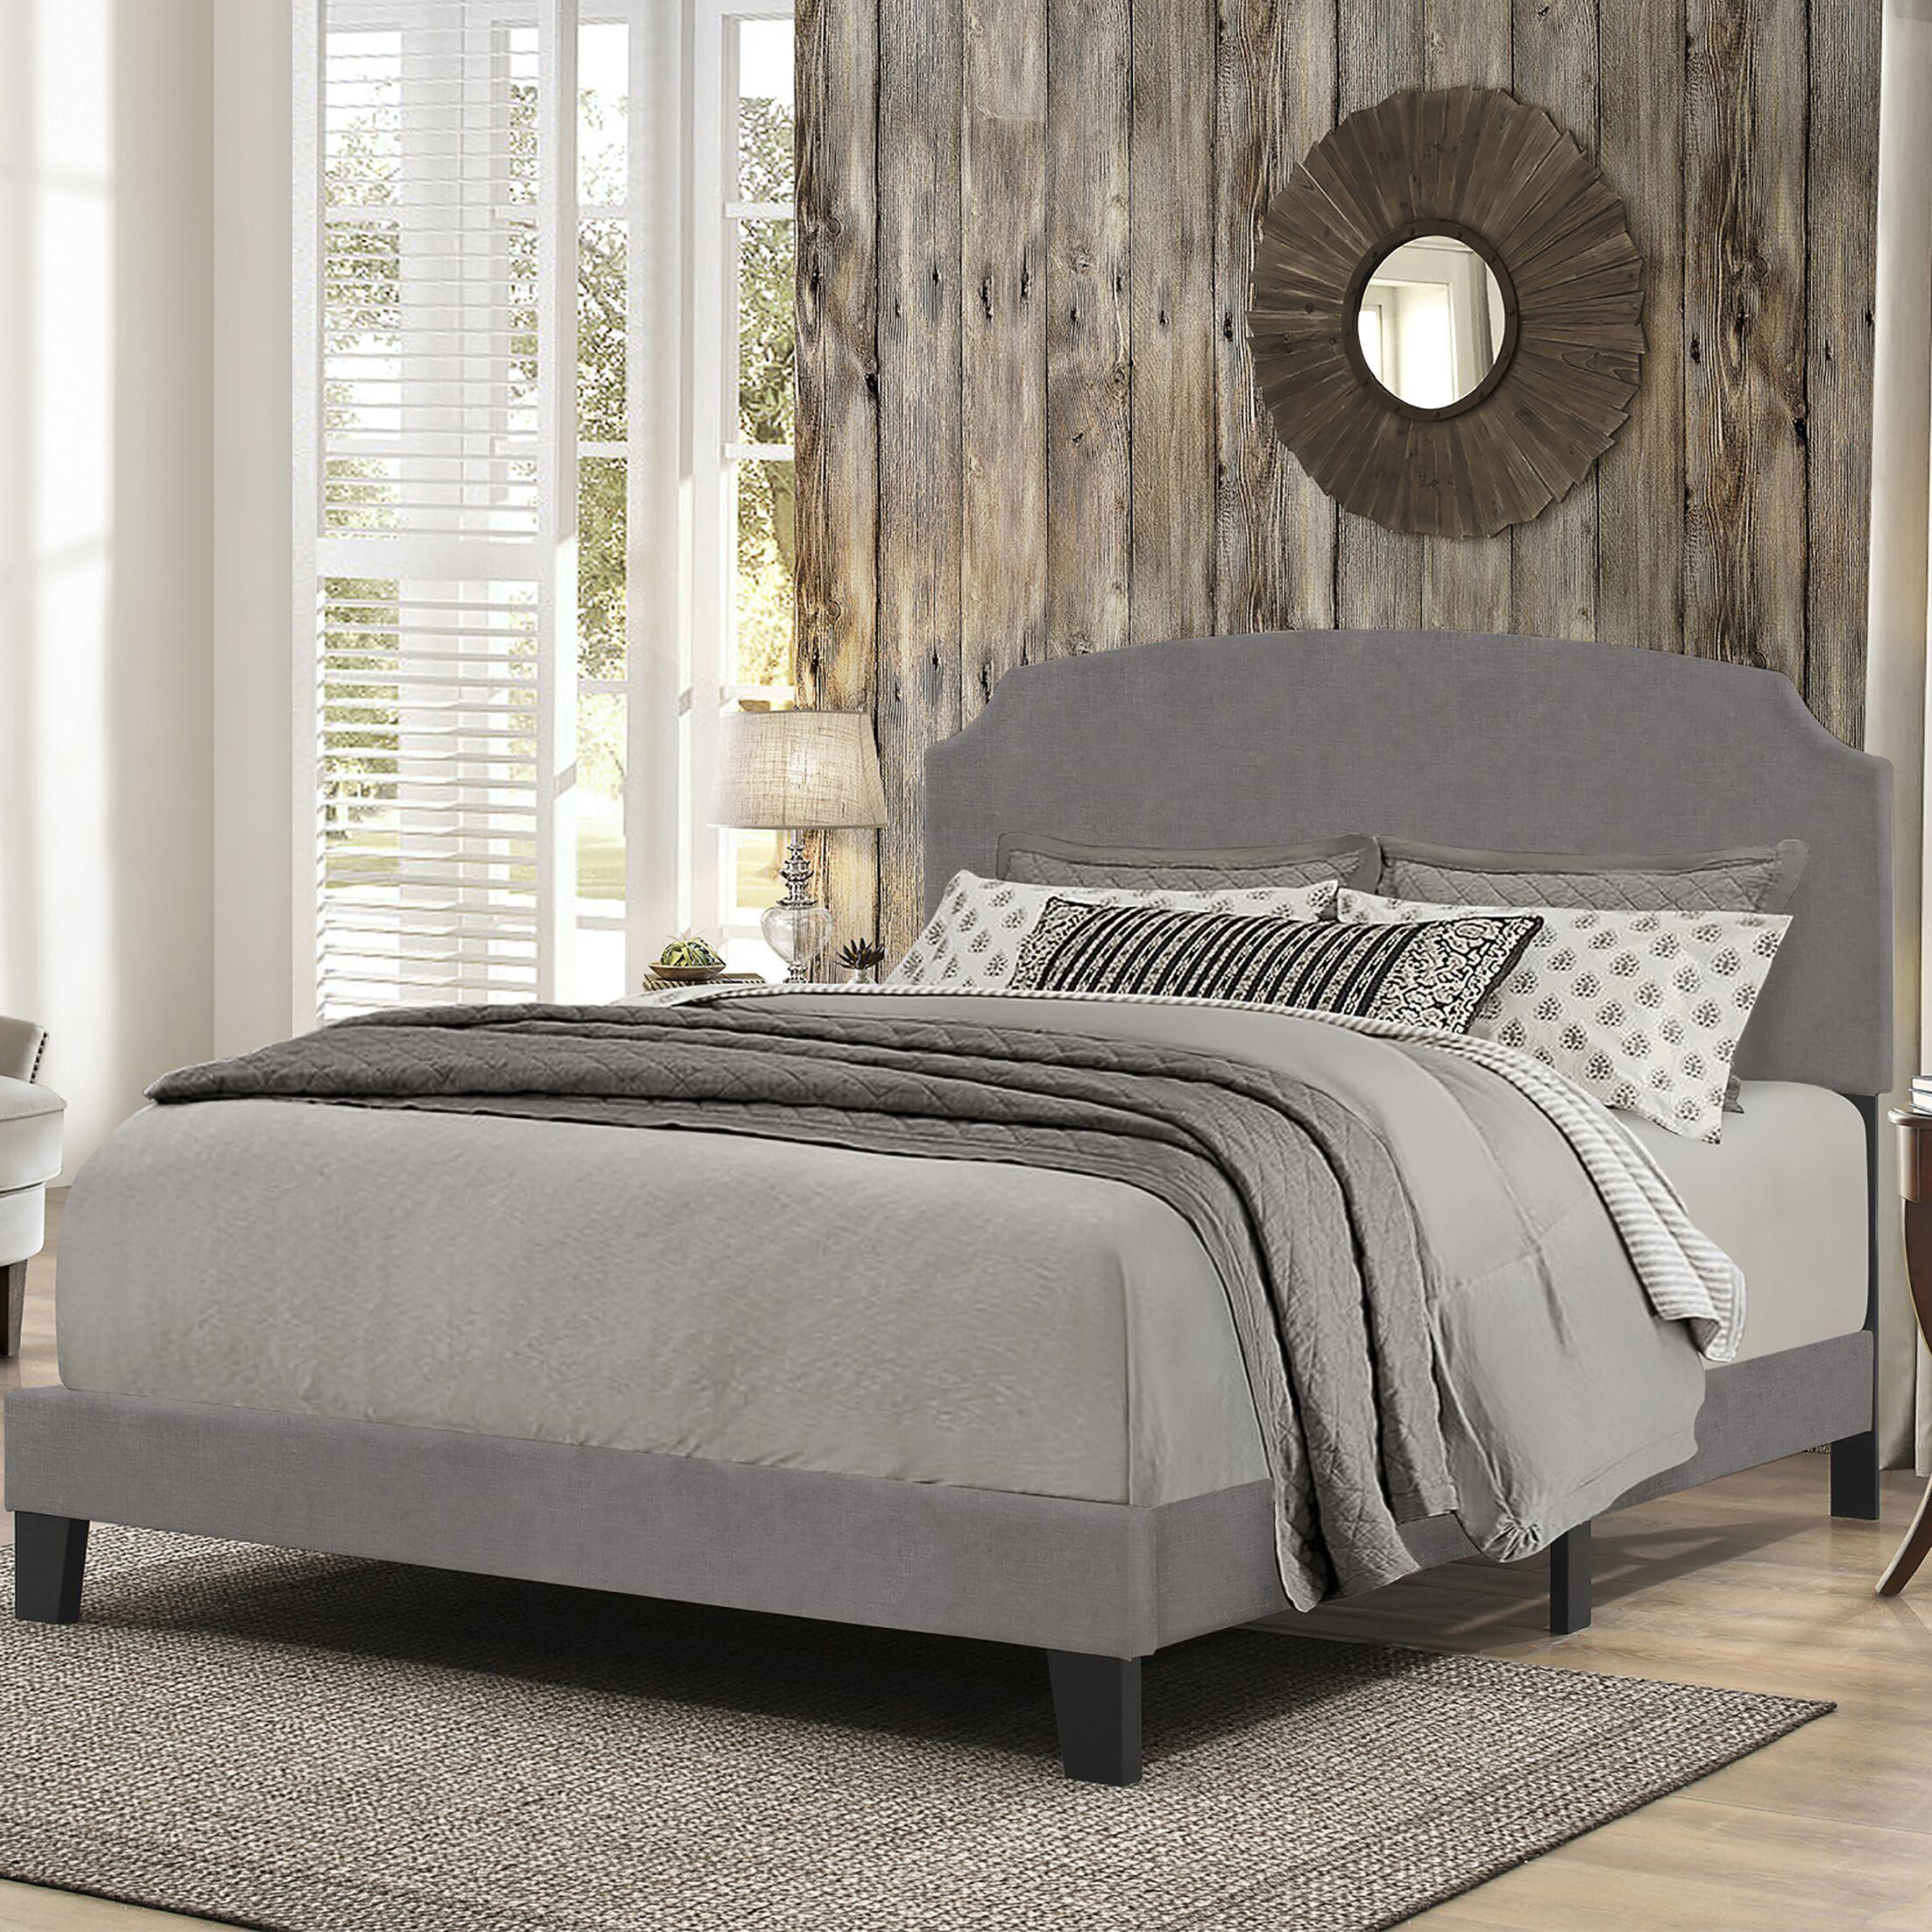 Surrey King Upholstered Panel Bed